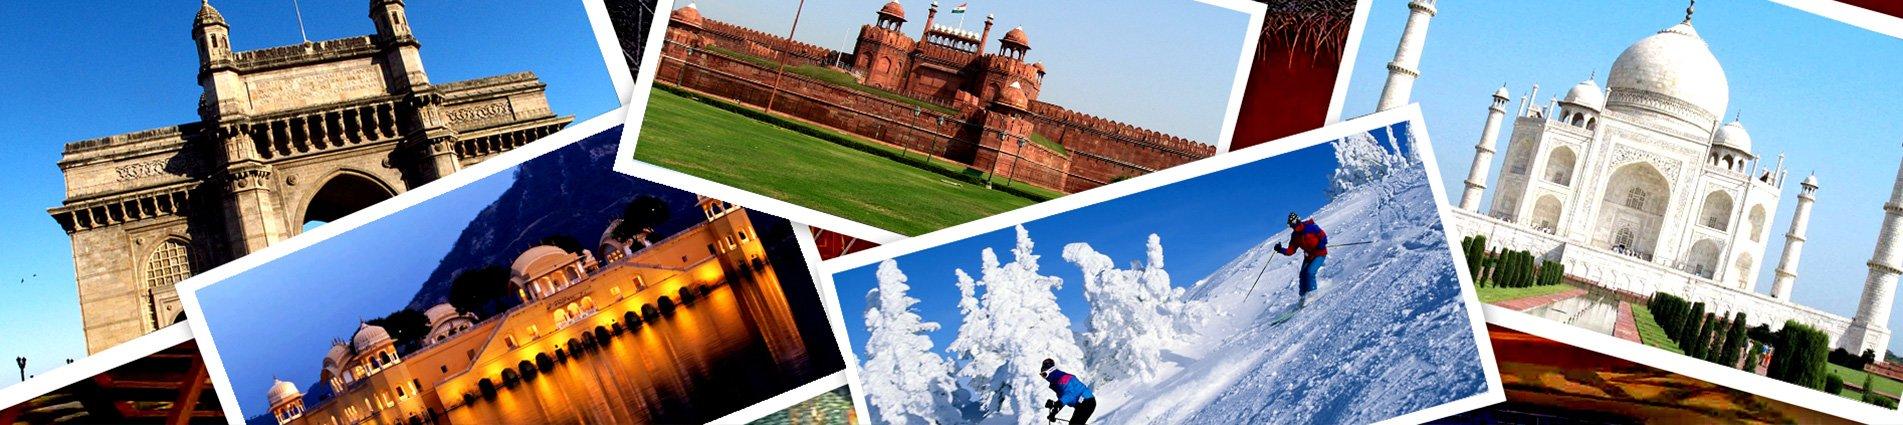 Golden Triangle Package : Delhi -Agra -Jaipur - Tour